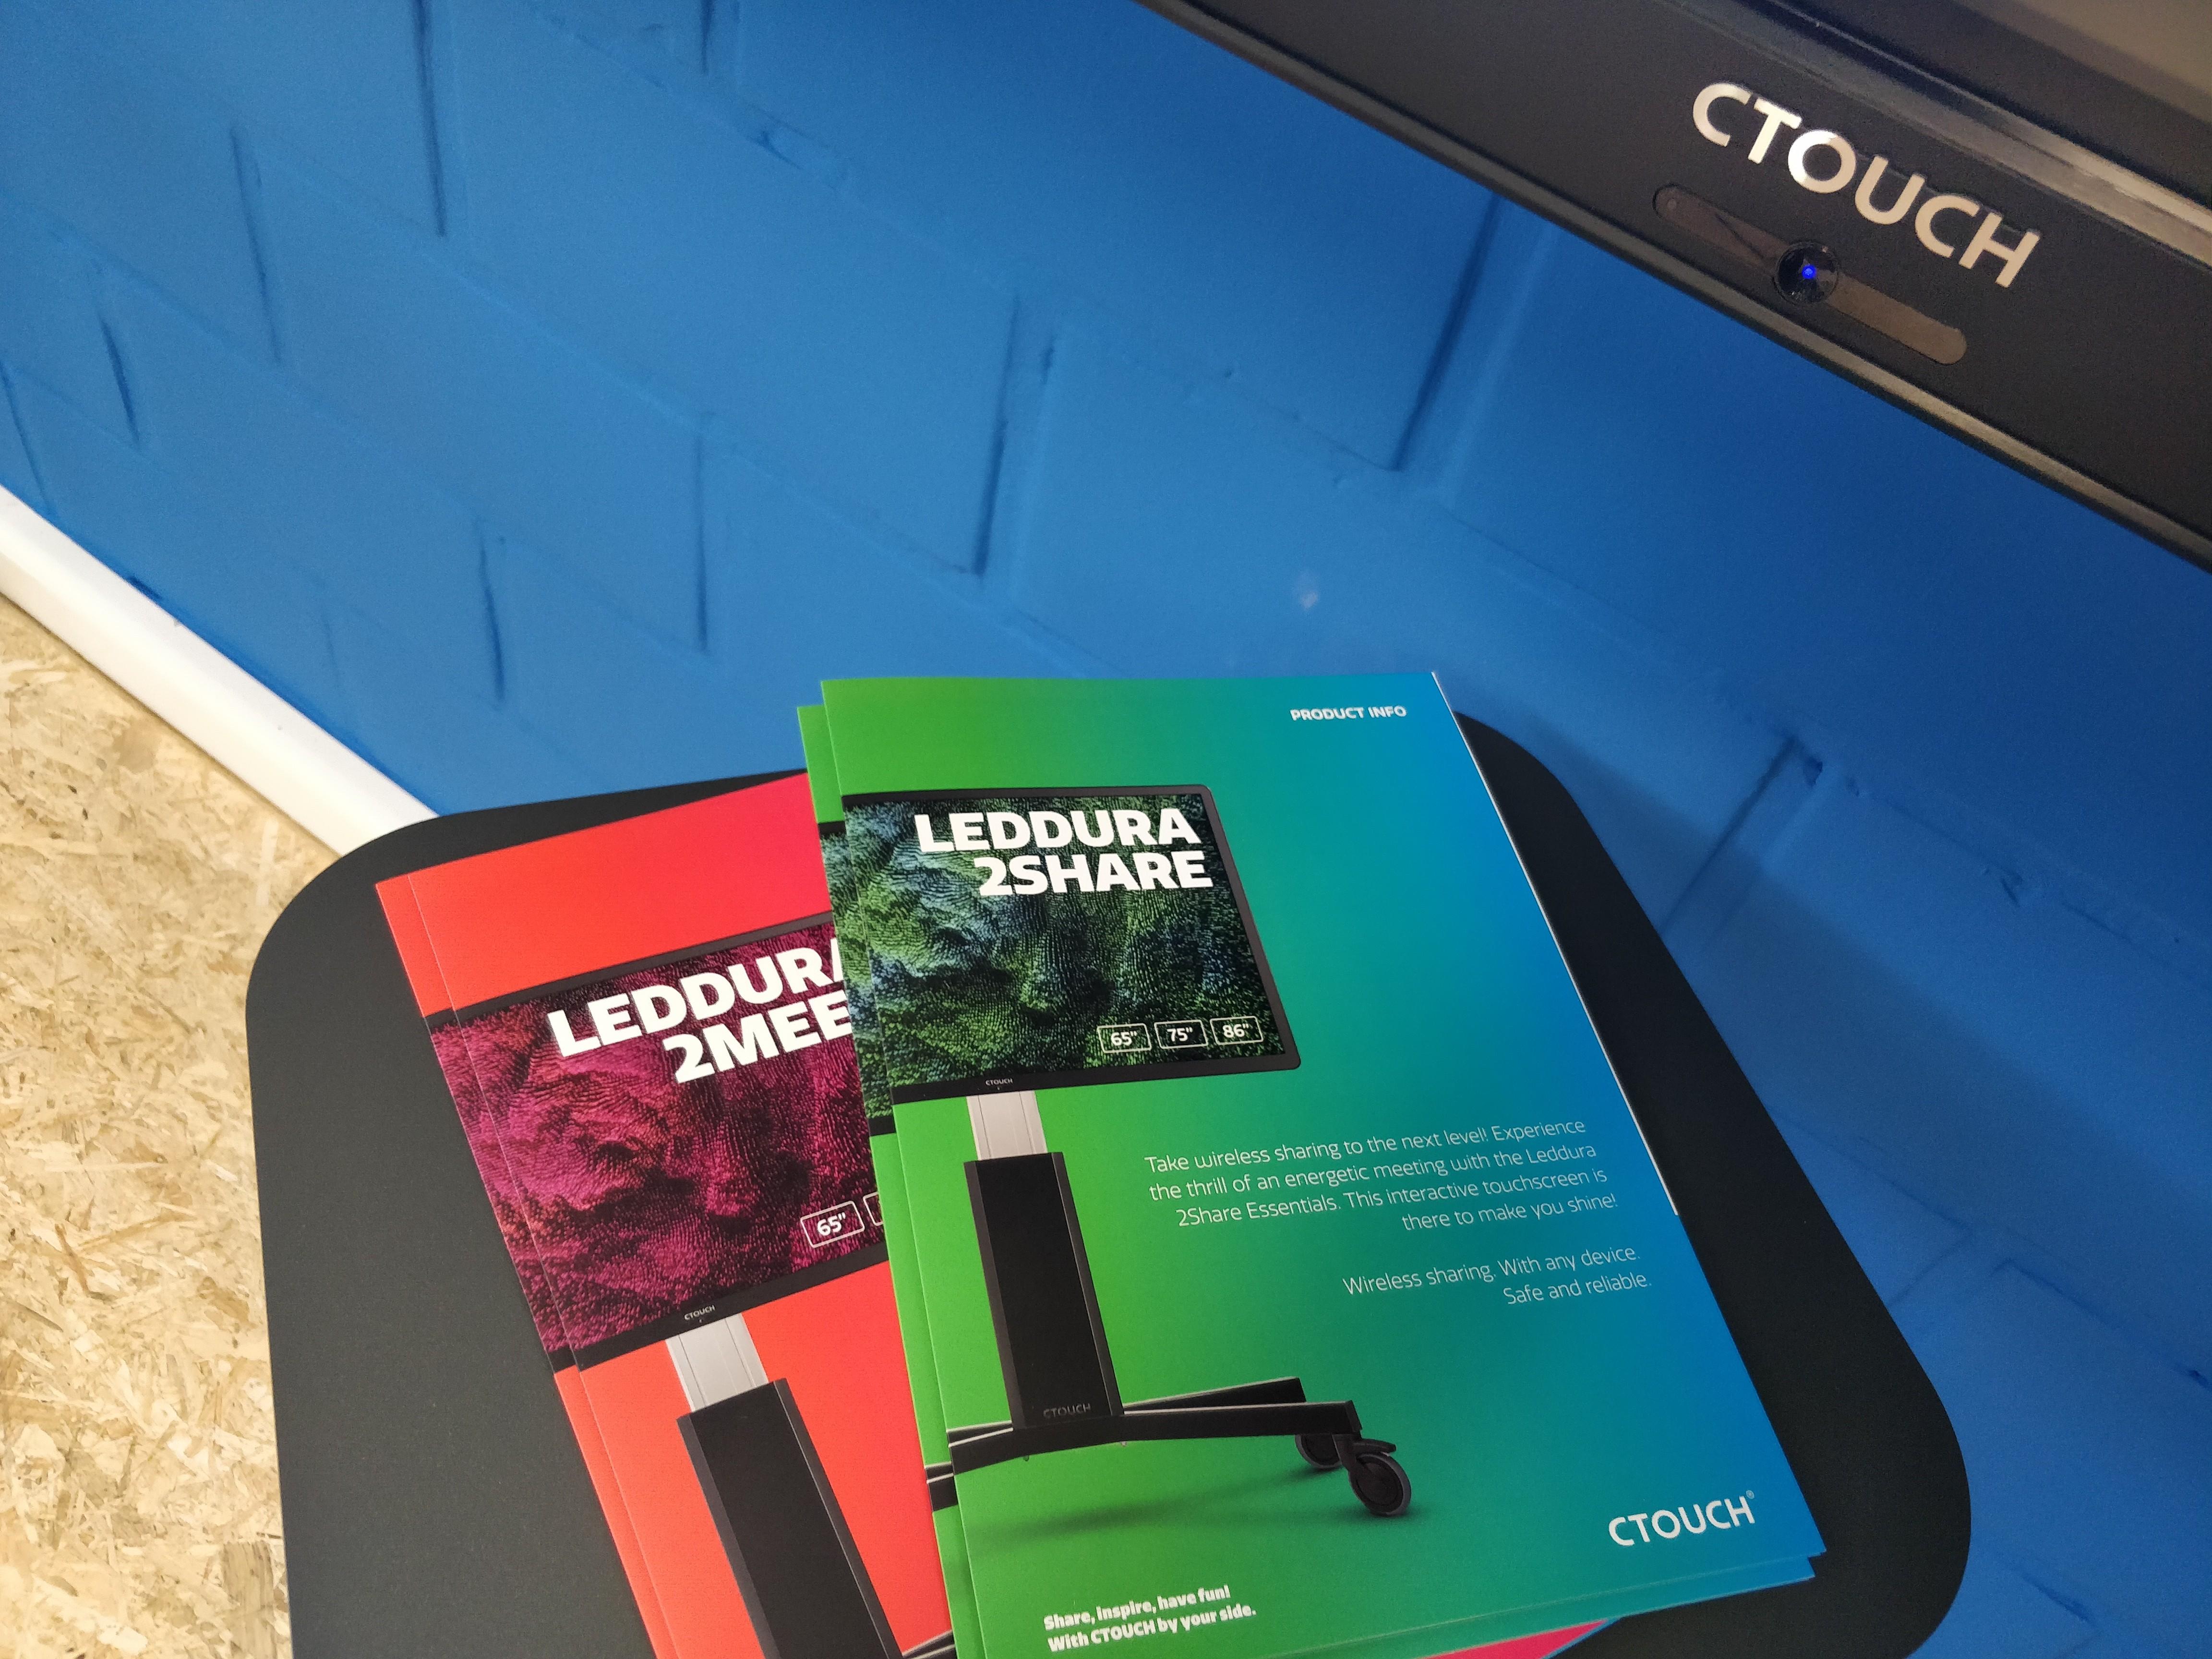 ctouch leddura 2meet 2share essentials marcelis halle belgie partner Folder op aanvraag